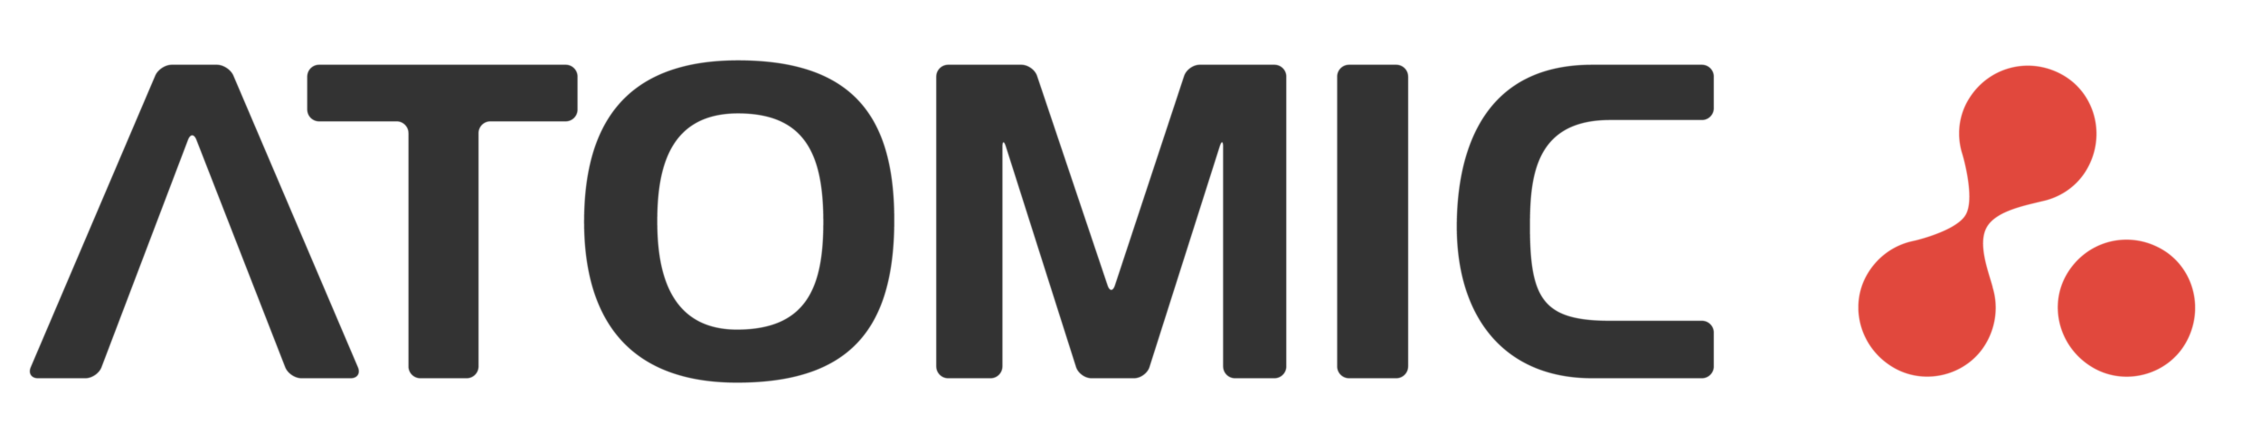 Atomic vc logo